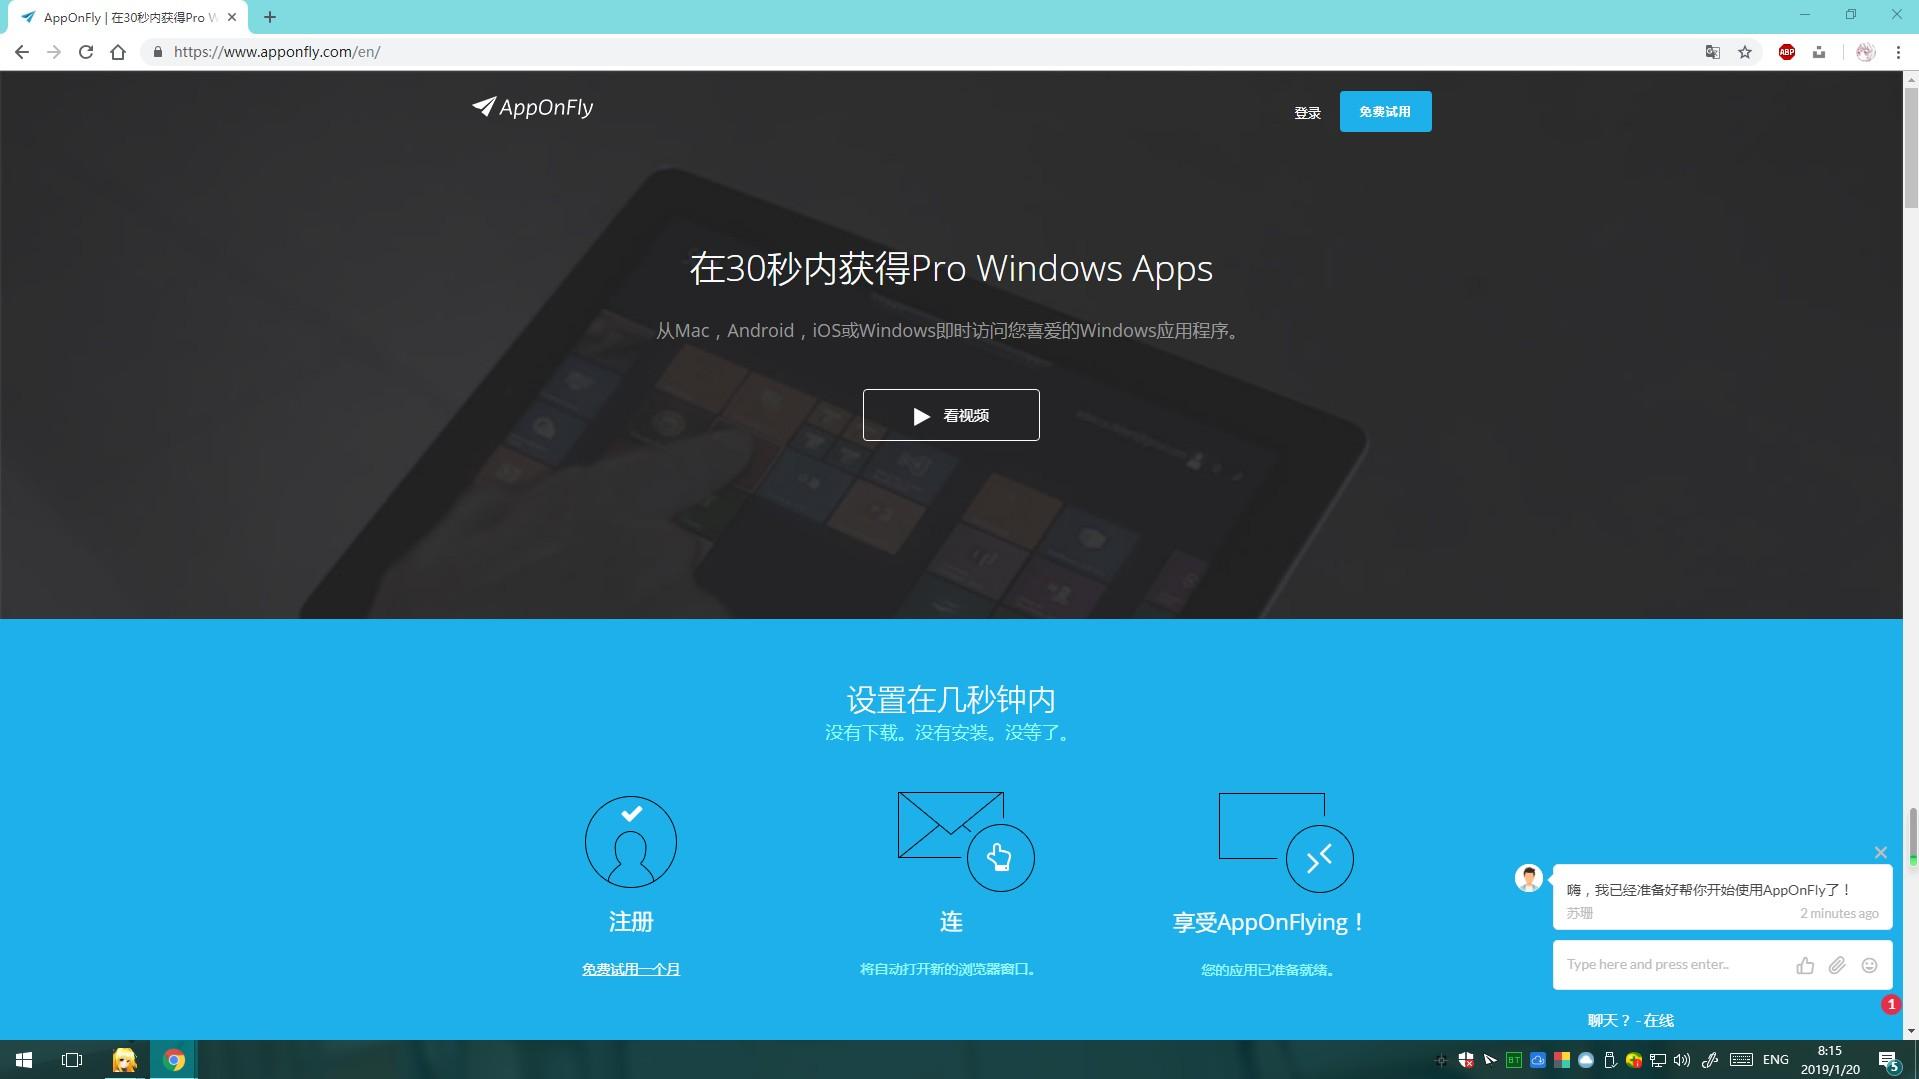 AppOnFly:免费一个月的Win10 VPS!! - 夜杏之窝| 不忘初心,方得始终